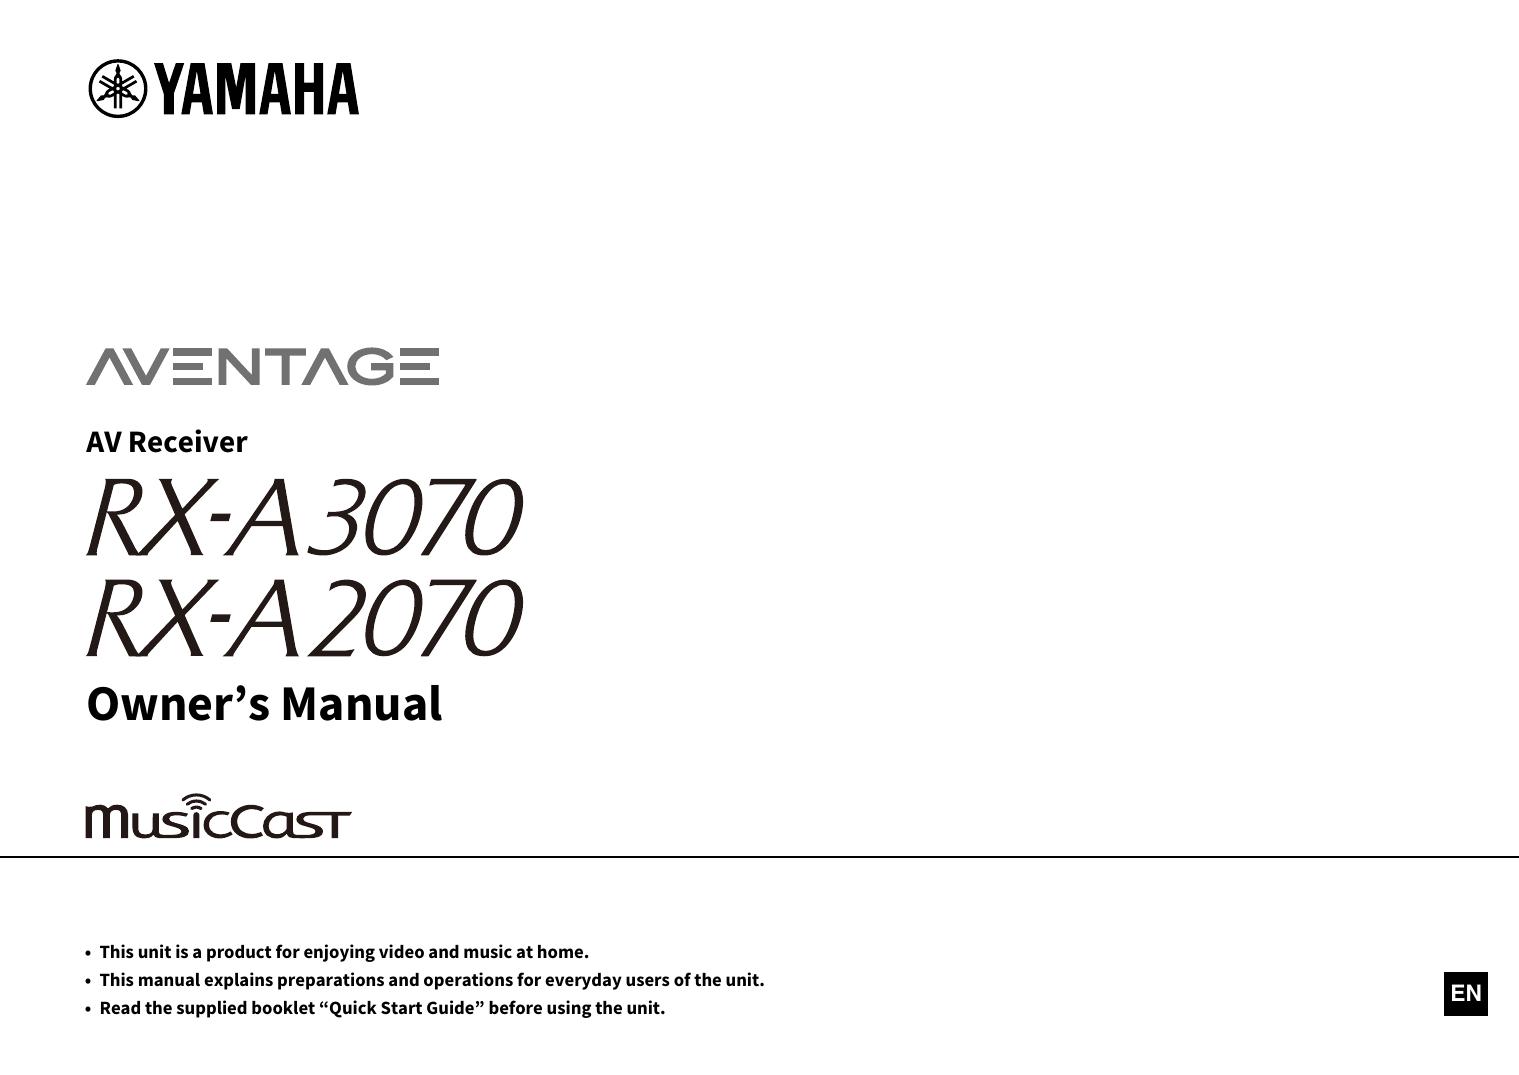 Yamaha RX-A3070 Owner's manual | manualzz com